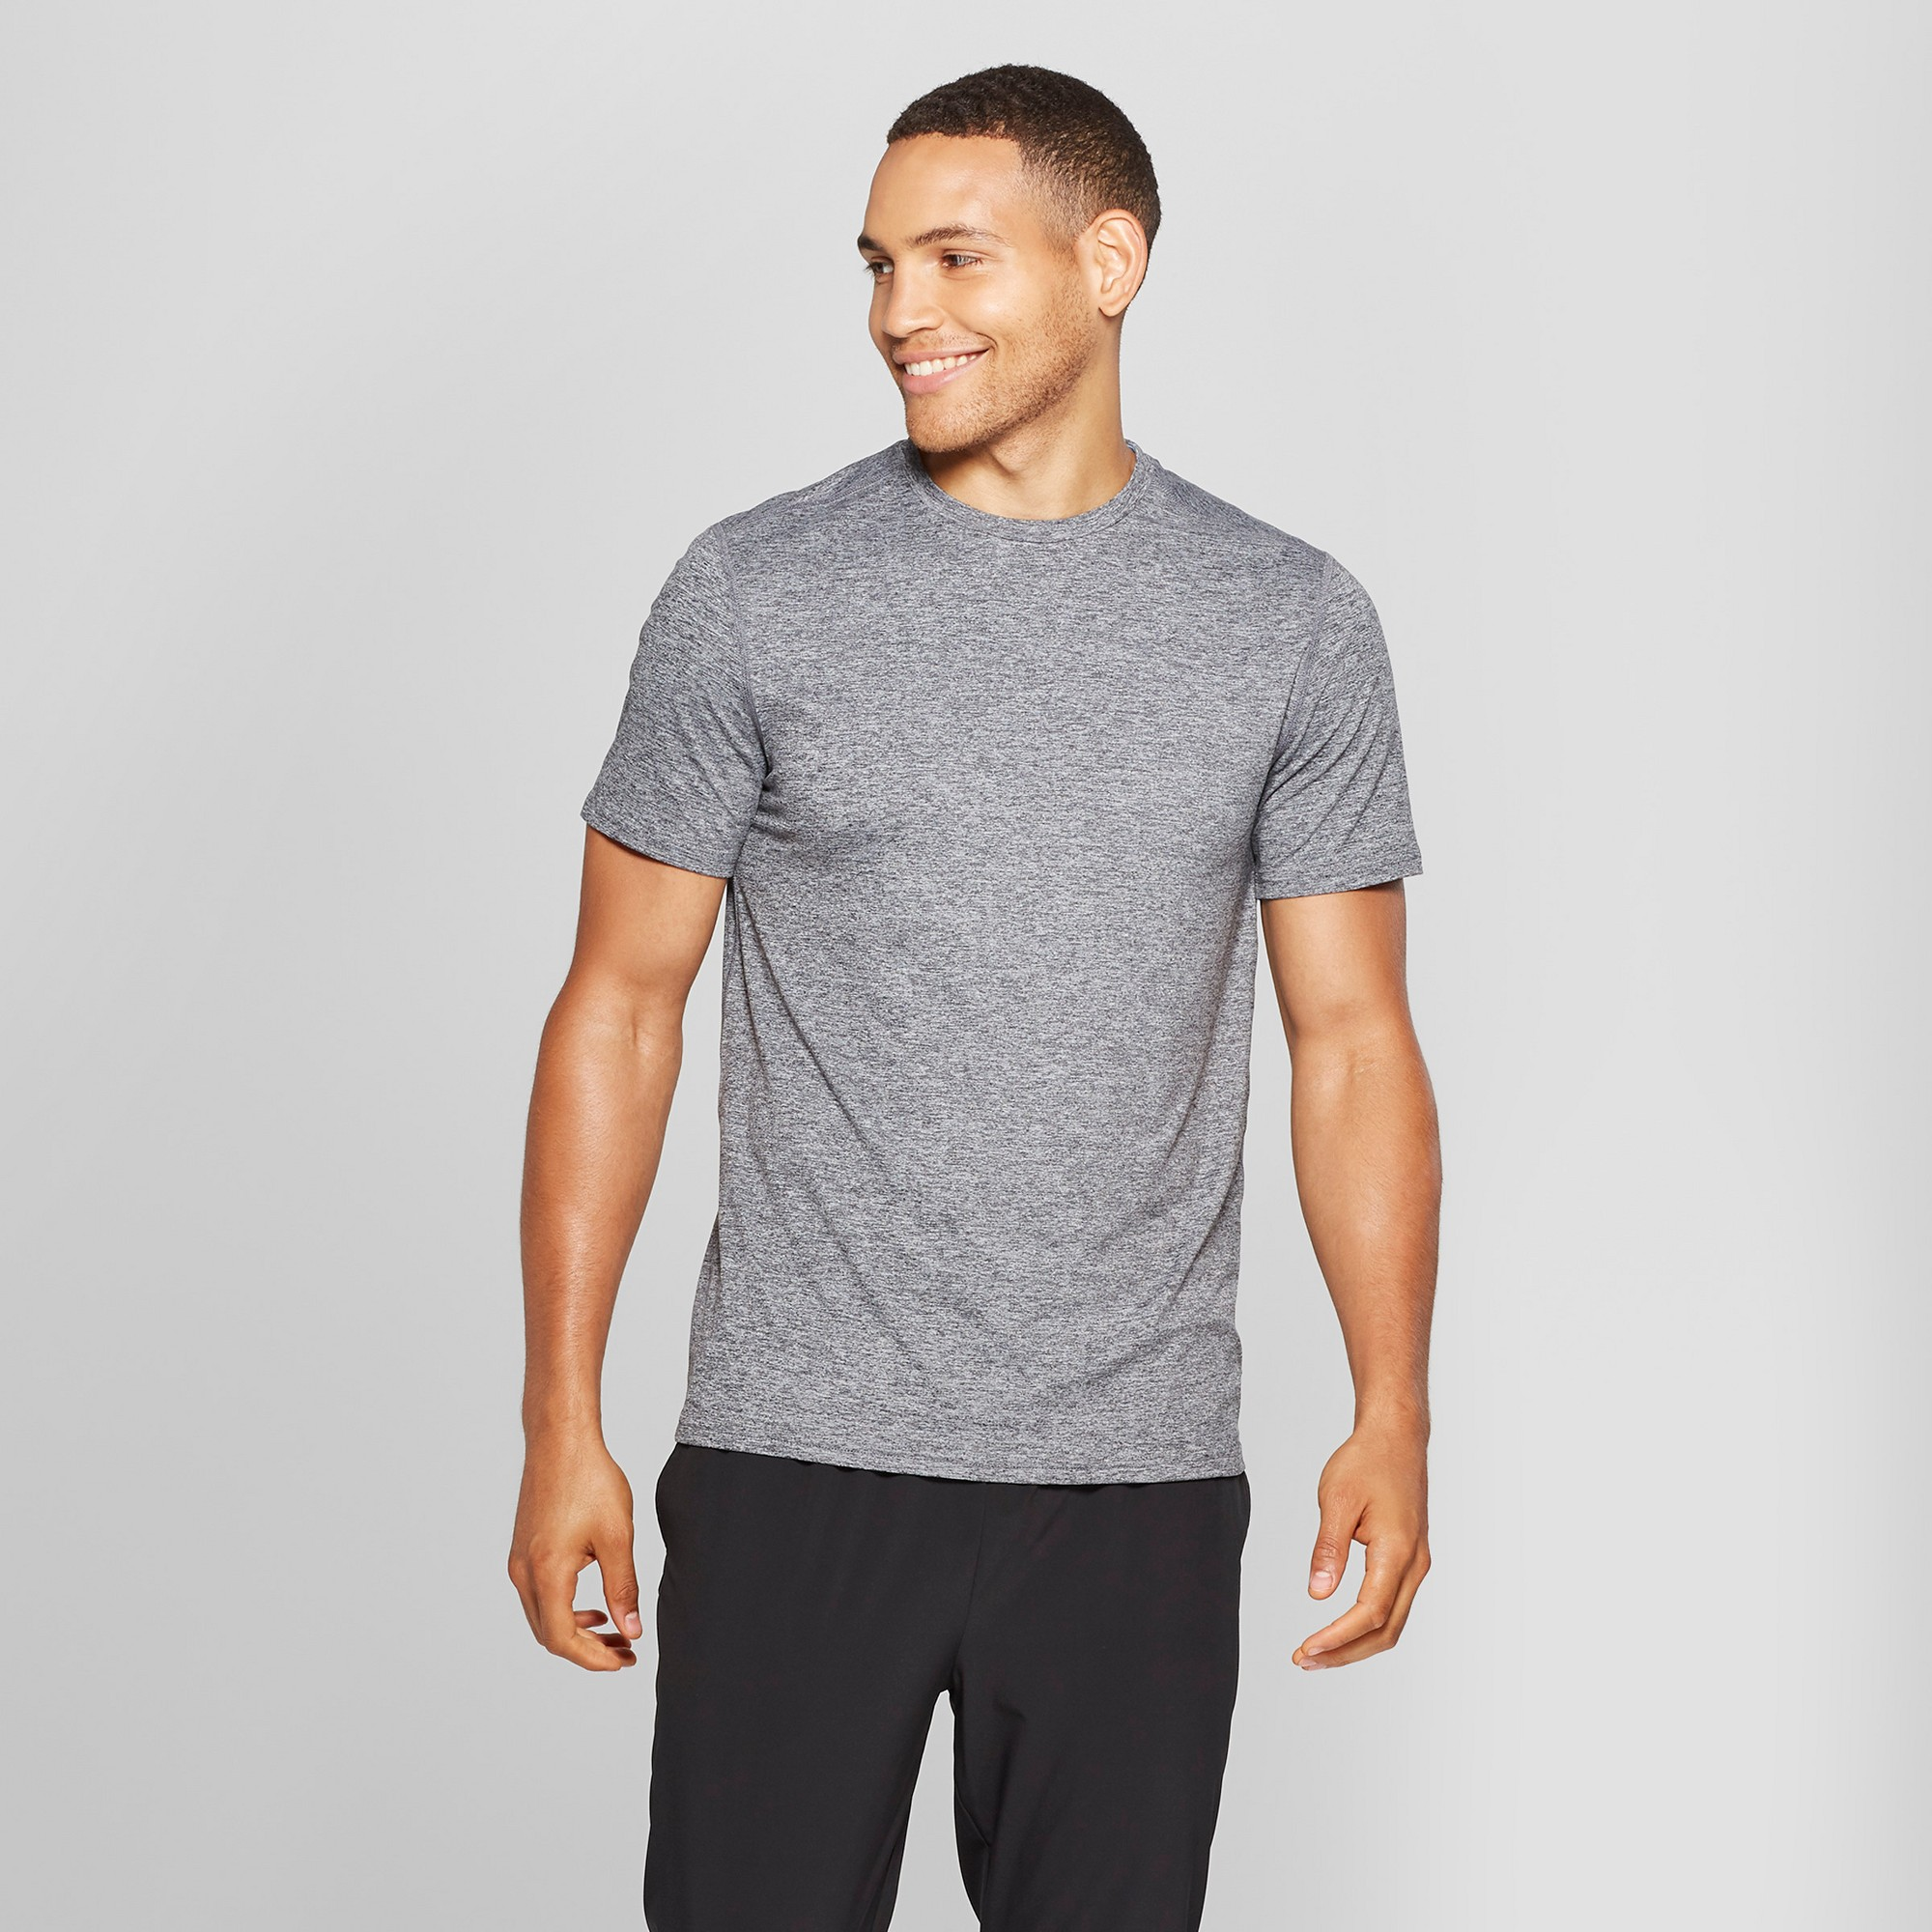 Men's Tech T-shirt - C9 Champion Black Heather XL